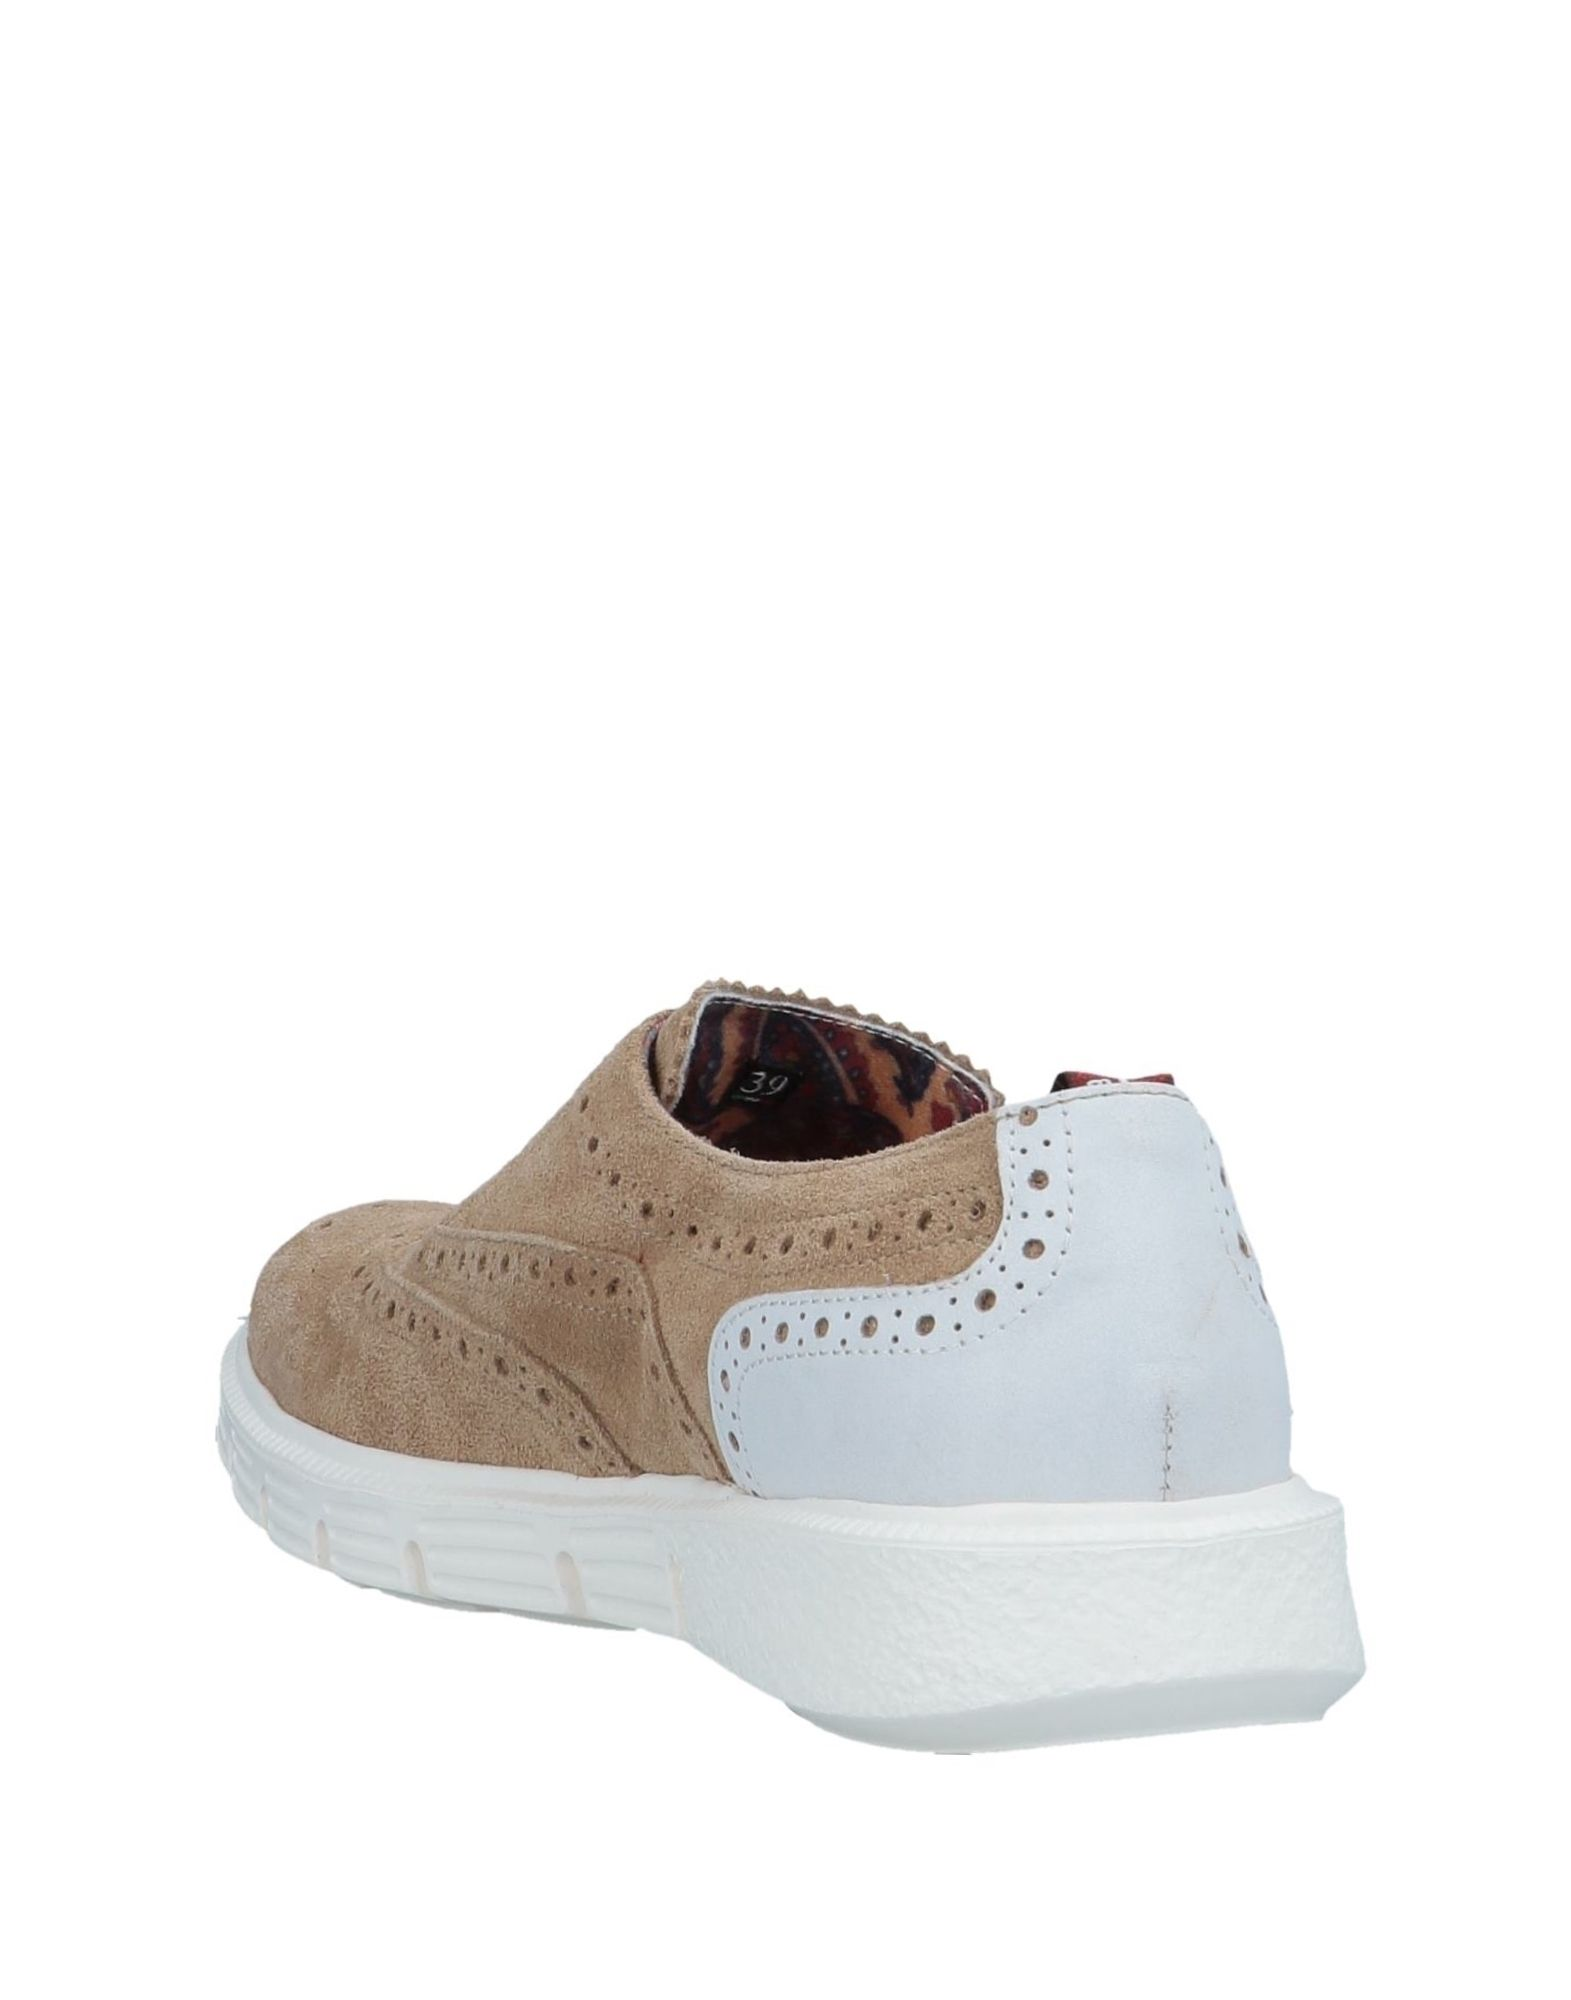 Rabatt echte Schuhe 11567188PX Yab Schnürschuhe Herren  11567188PX Schuhe 901efa